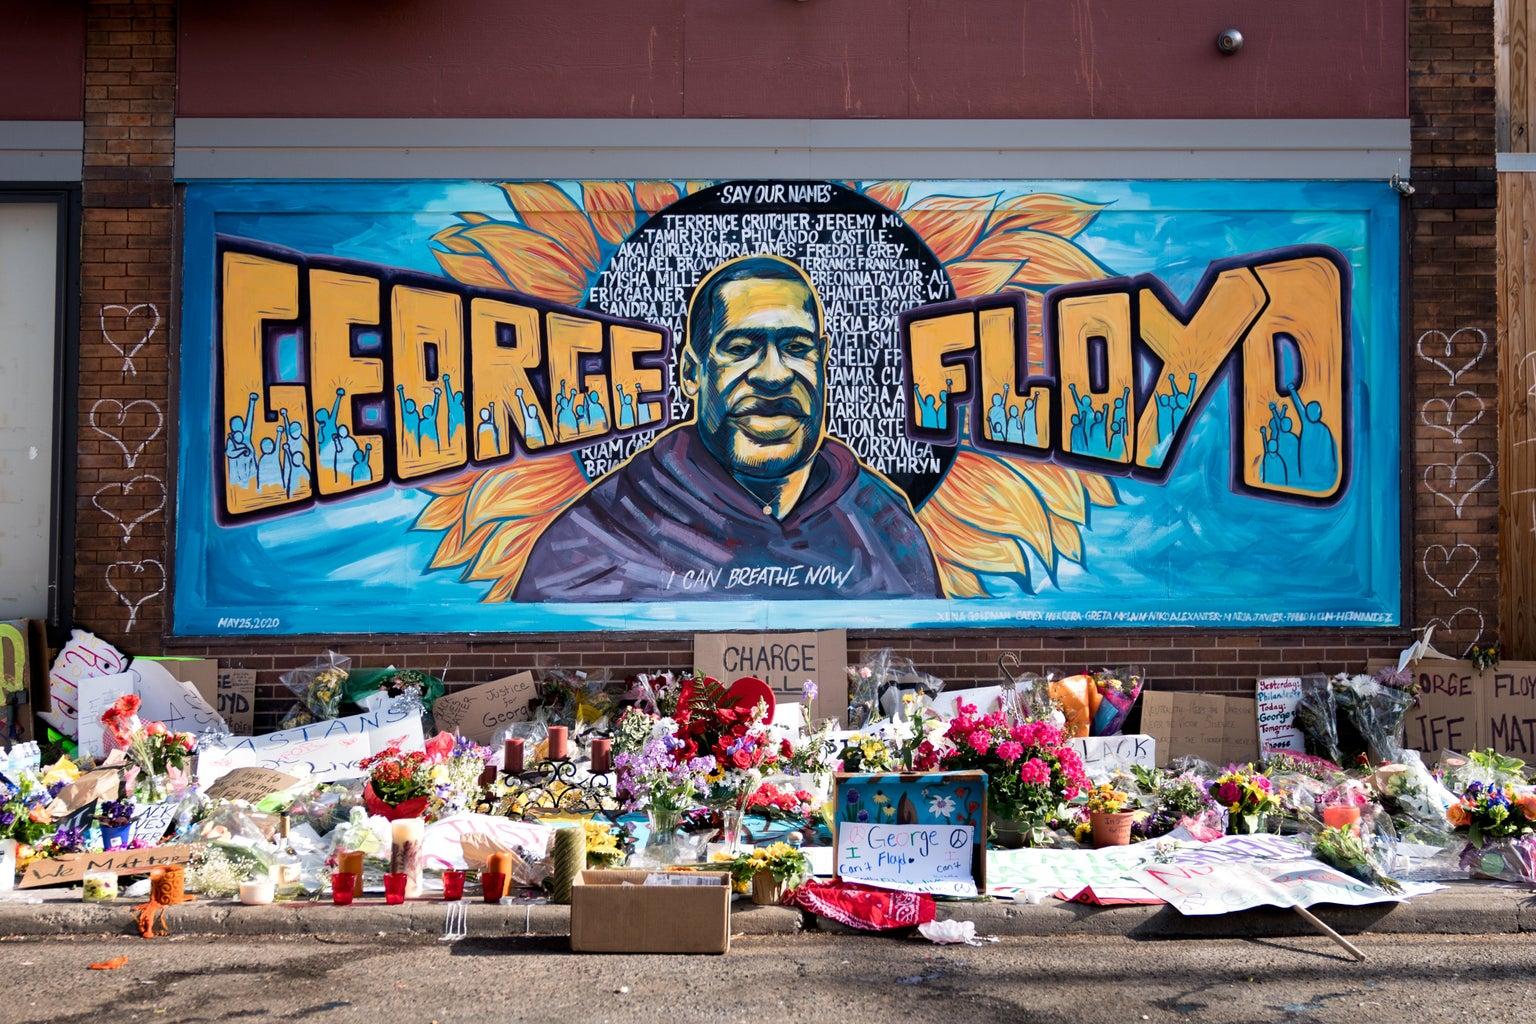 George Floyd minneapolis protest mural